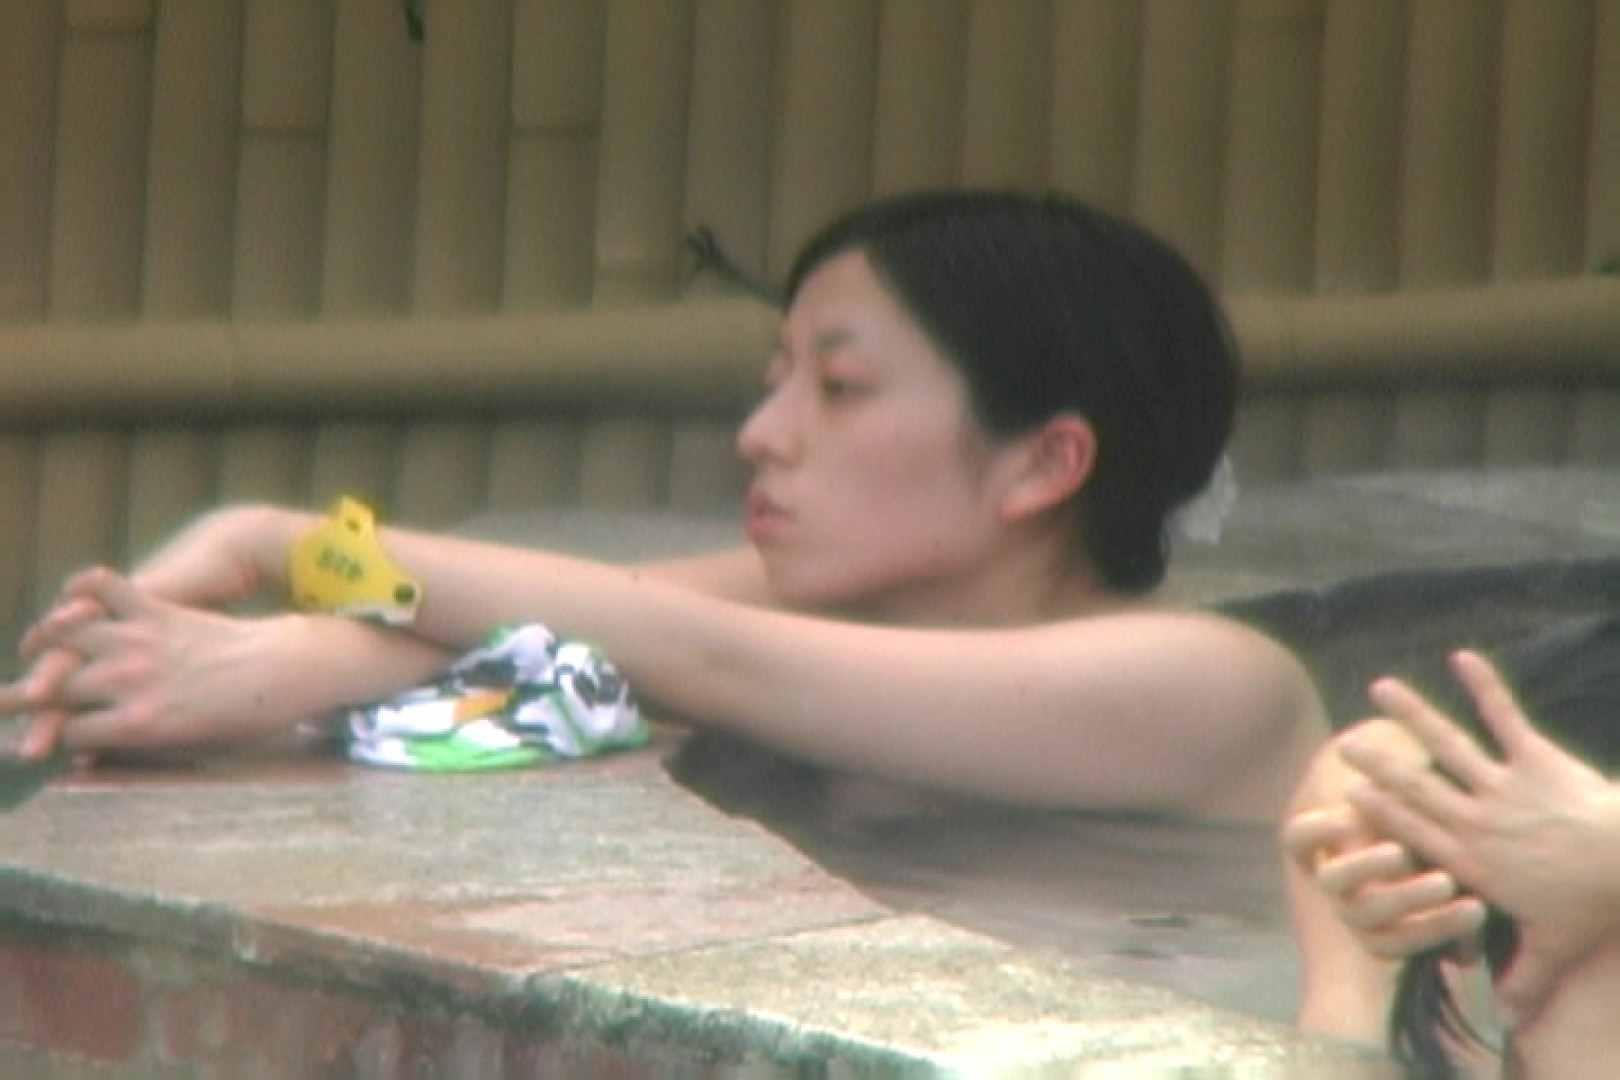 Aquaな露天風呂Vol.562 露天 AV無料動画キャプチャ 109画像 80